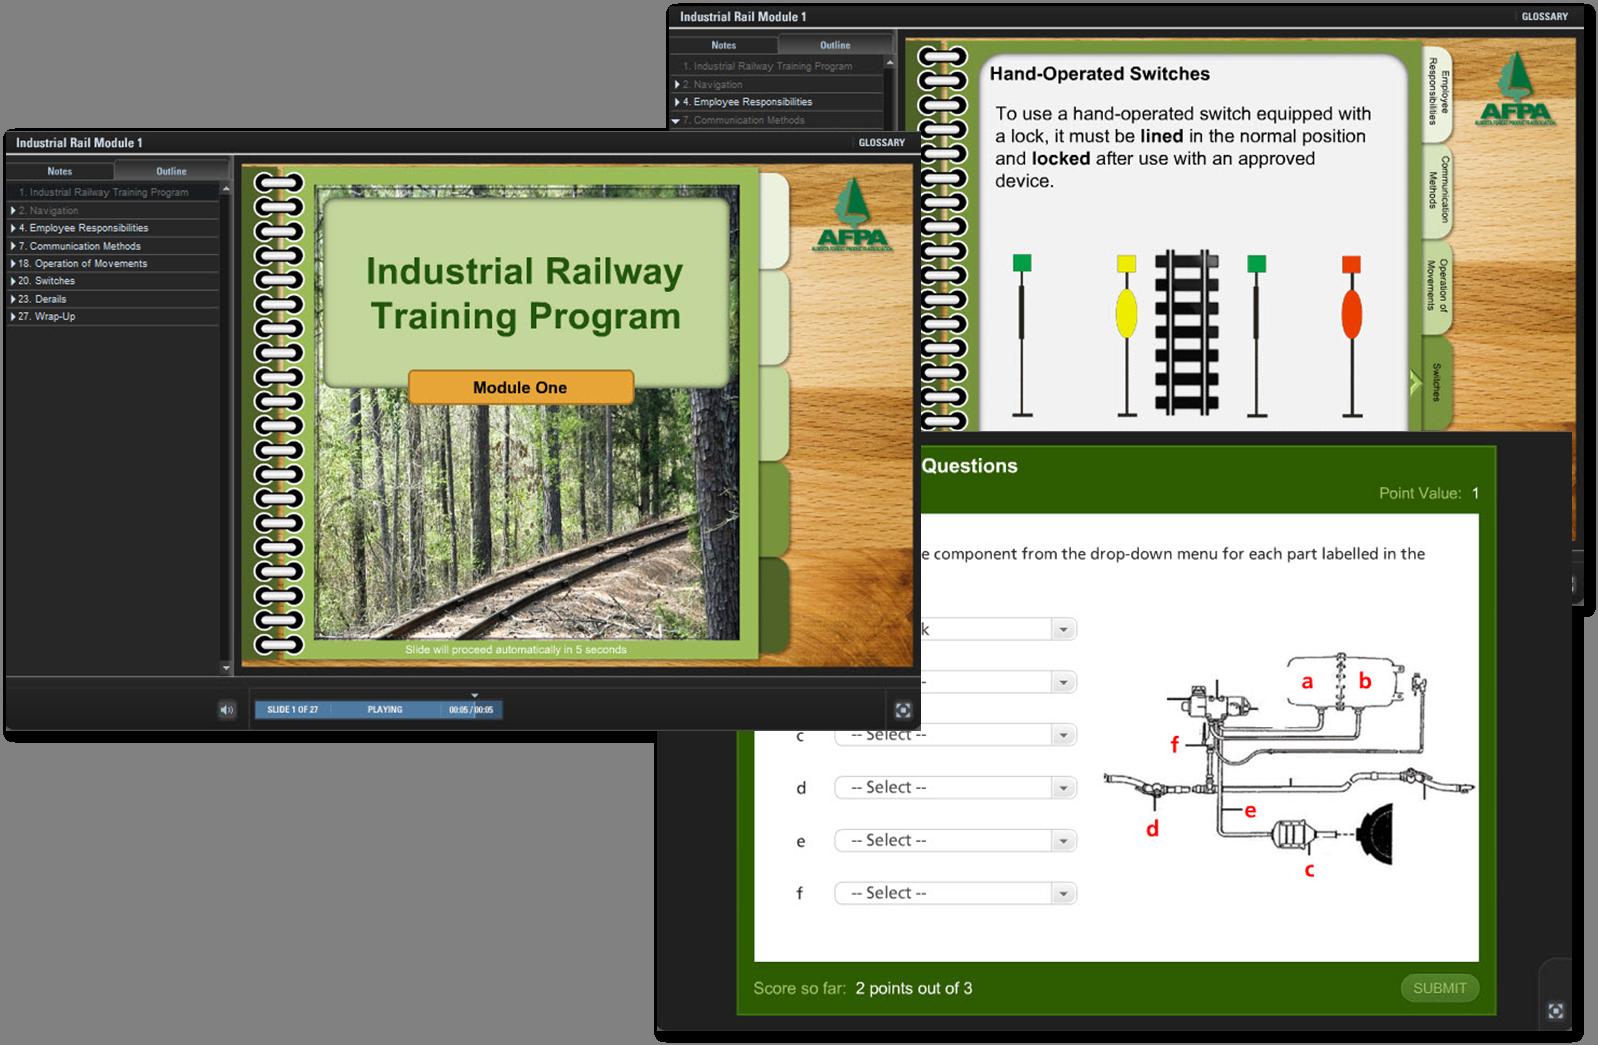 AFPA Industrial Railway